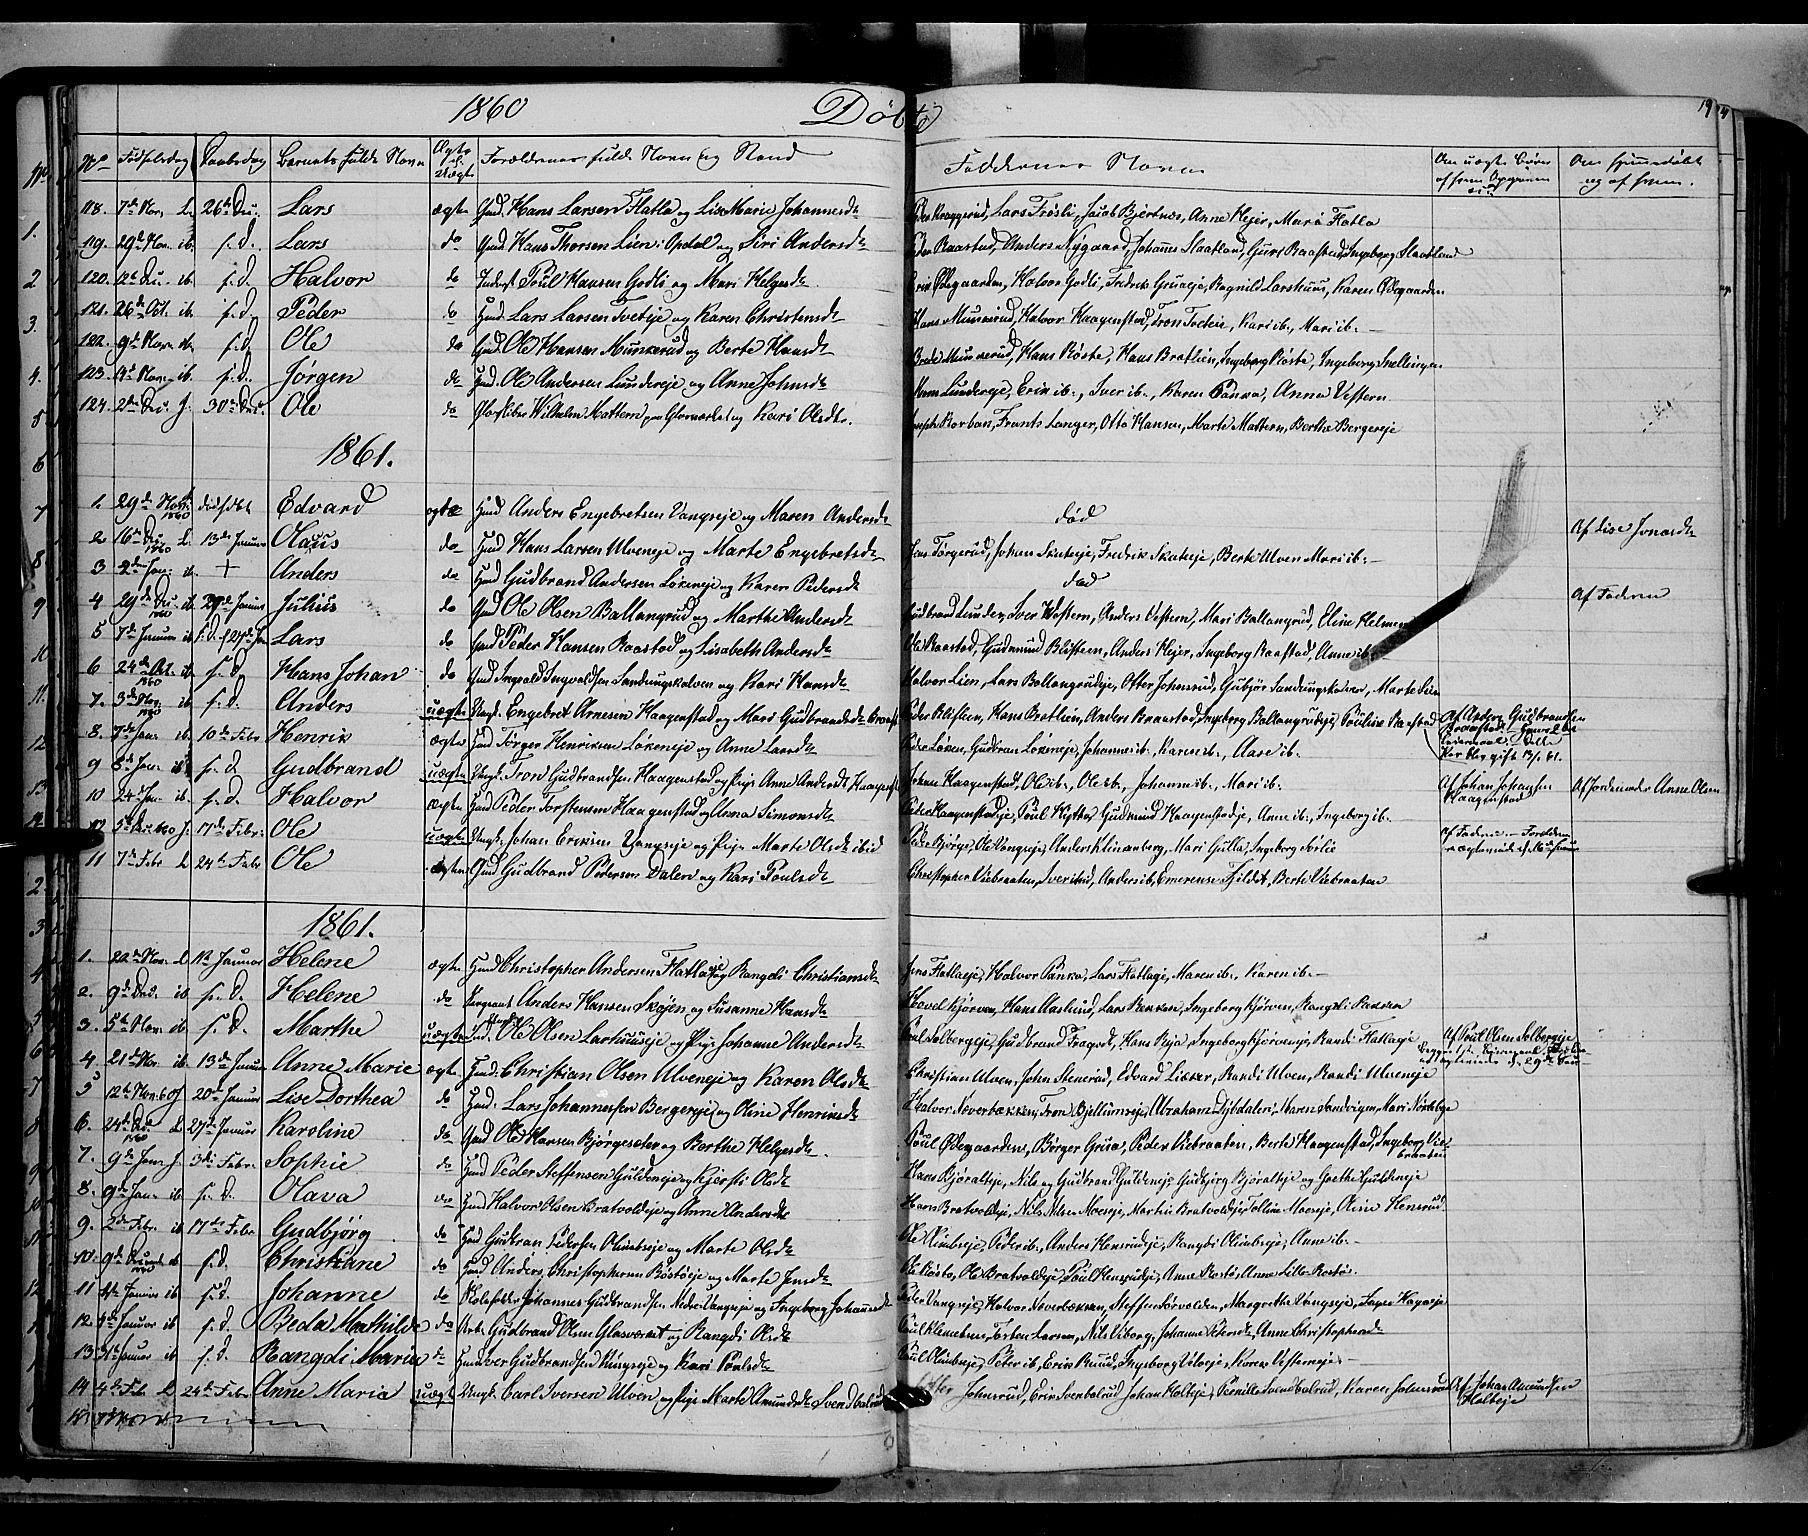 SAH, Jevnaker prestekontor, Ministerialbok nr. 7, 1858-1876, s. 19